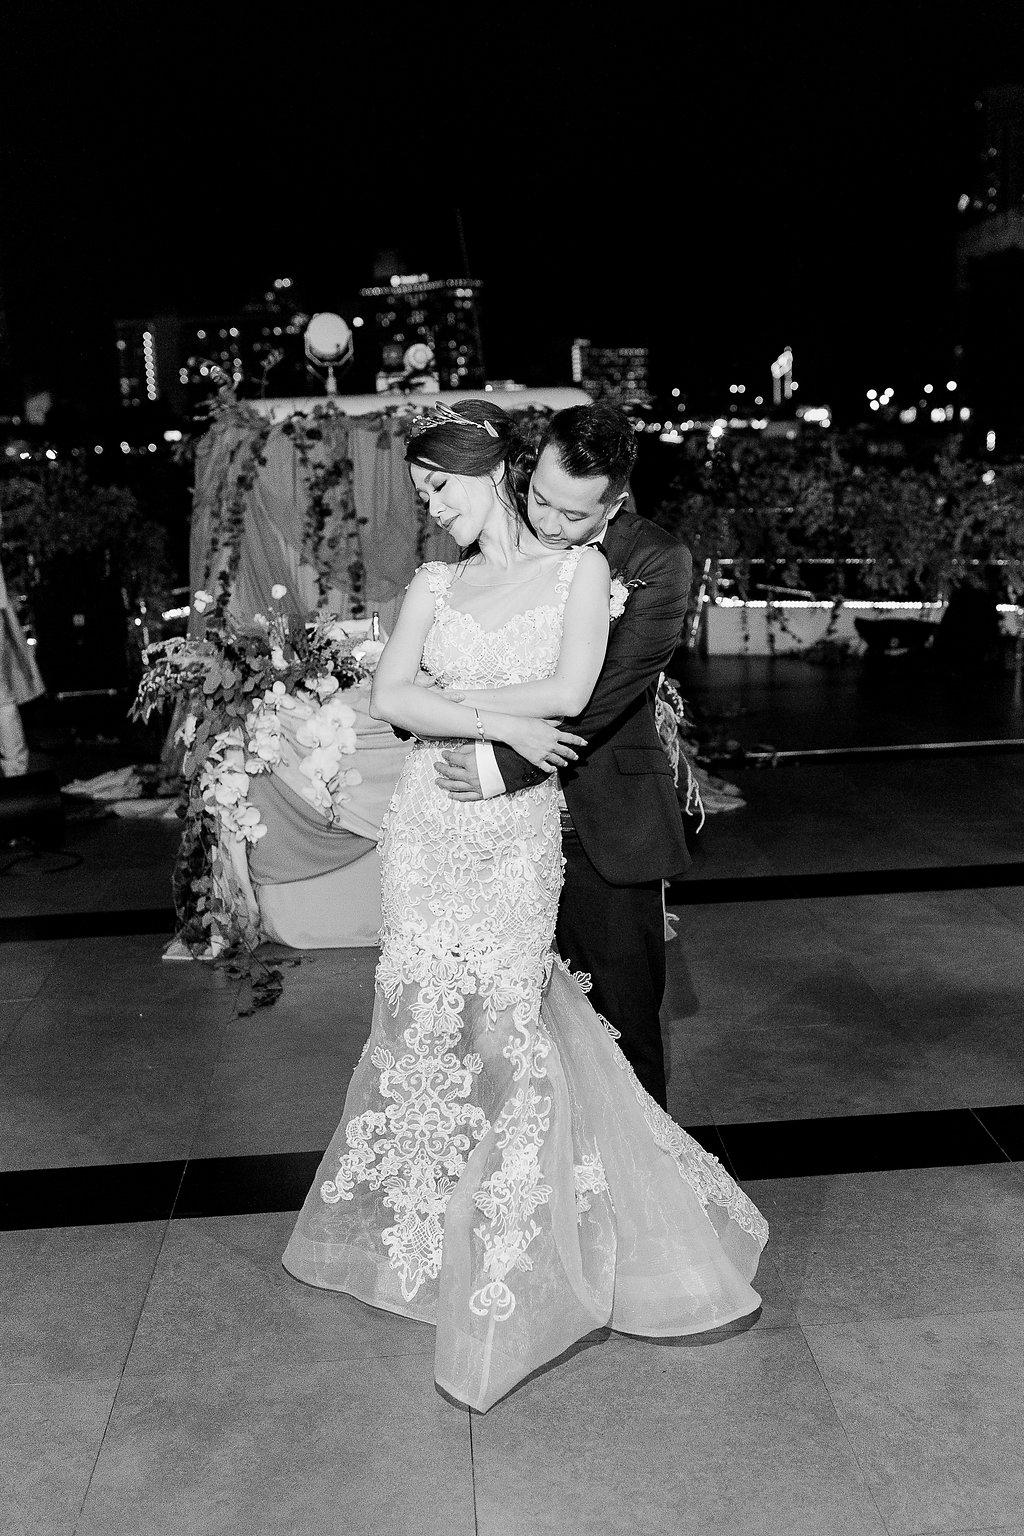 Luxe destination wedding in Jakarta and Bankok   fine art film wedding photographer Tanja Kibogo 4008.JPG